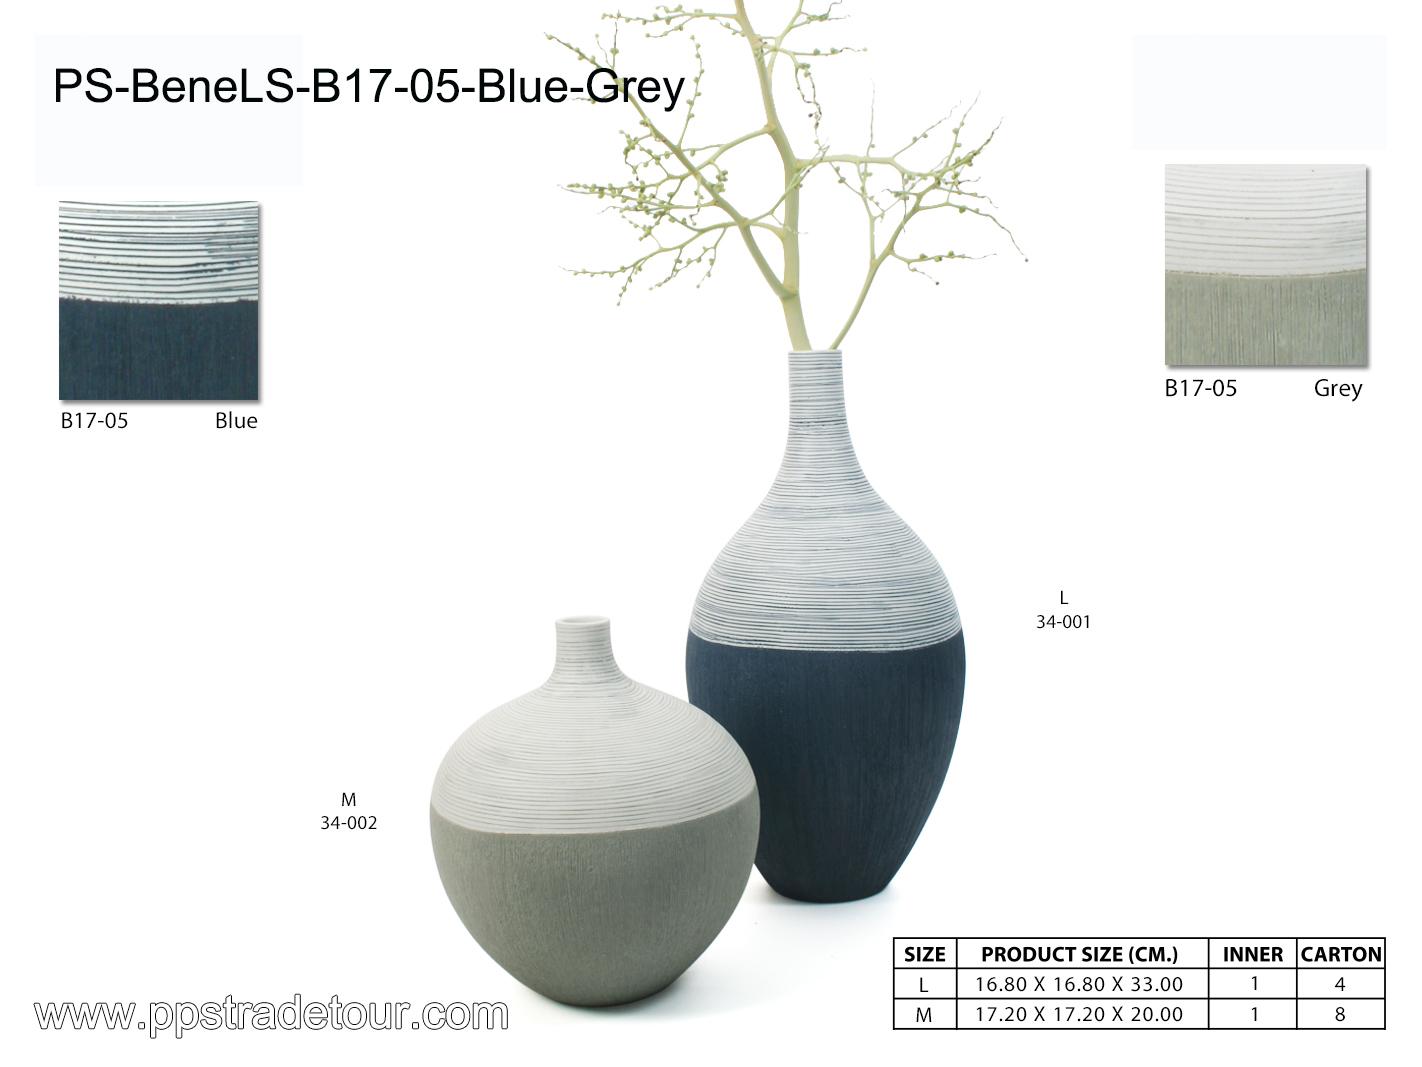 PSCV-BeneLS-B17-05-Blue-Grey